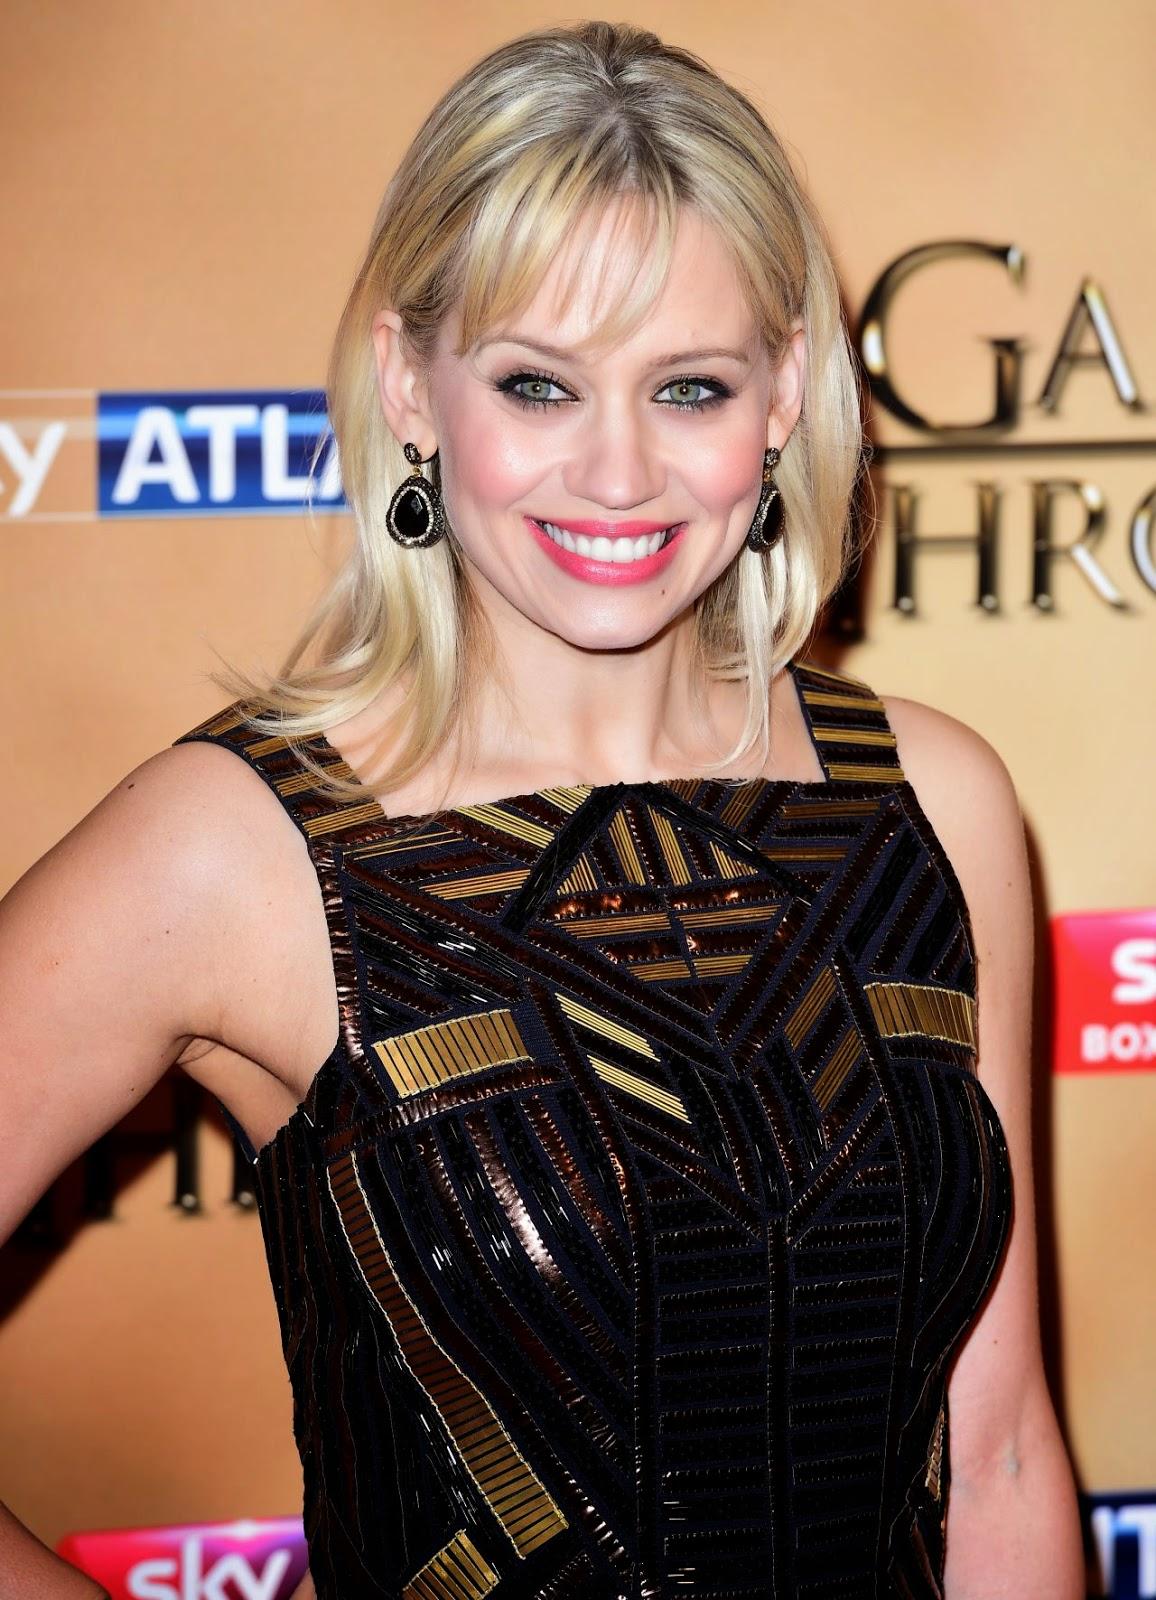 Kimberly Wyatt – Game of Thrones Season 5 Premiere in London